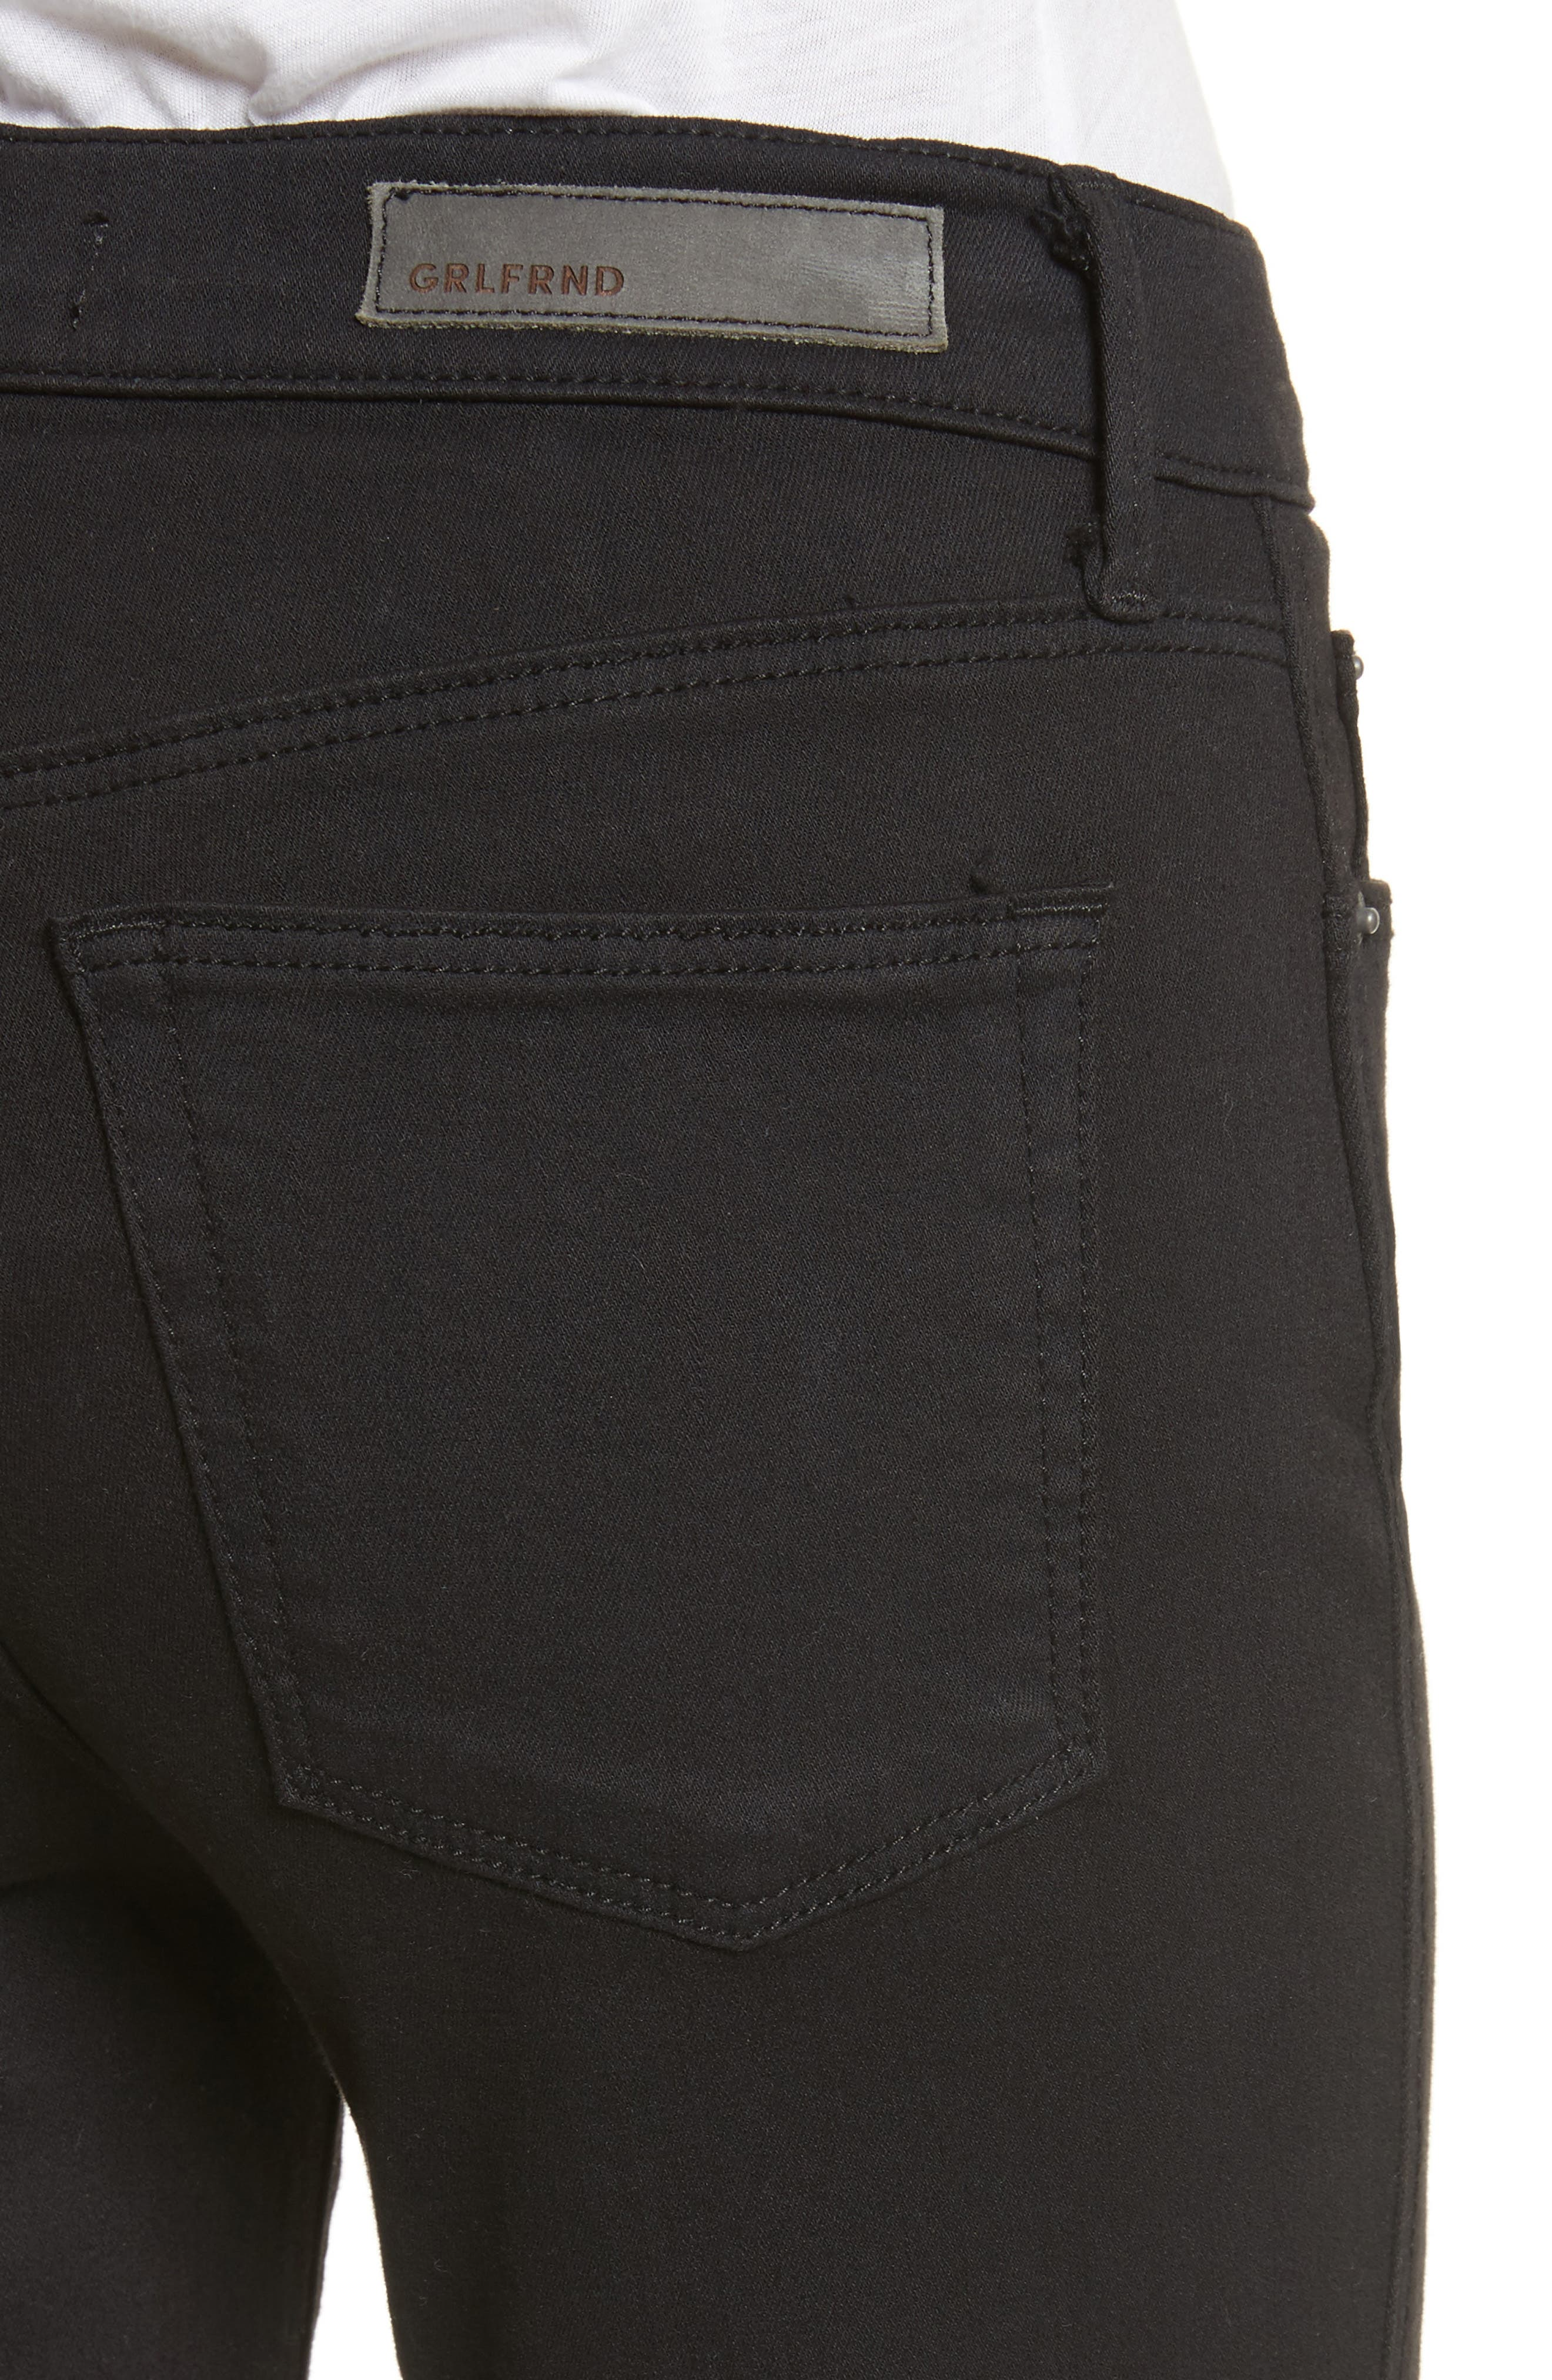 Joan Crop Flare Jeans,                             Alternate thumbnail 4, color,                             001